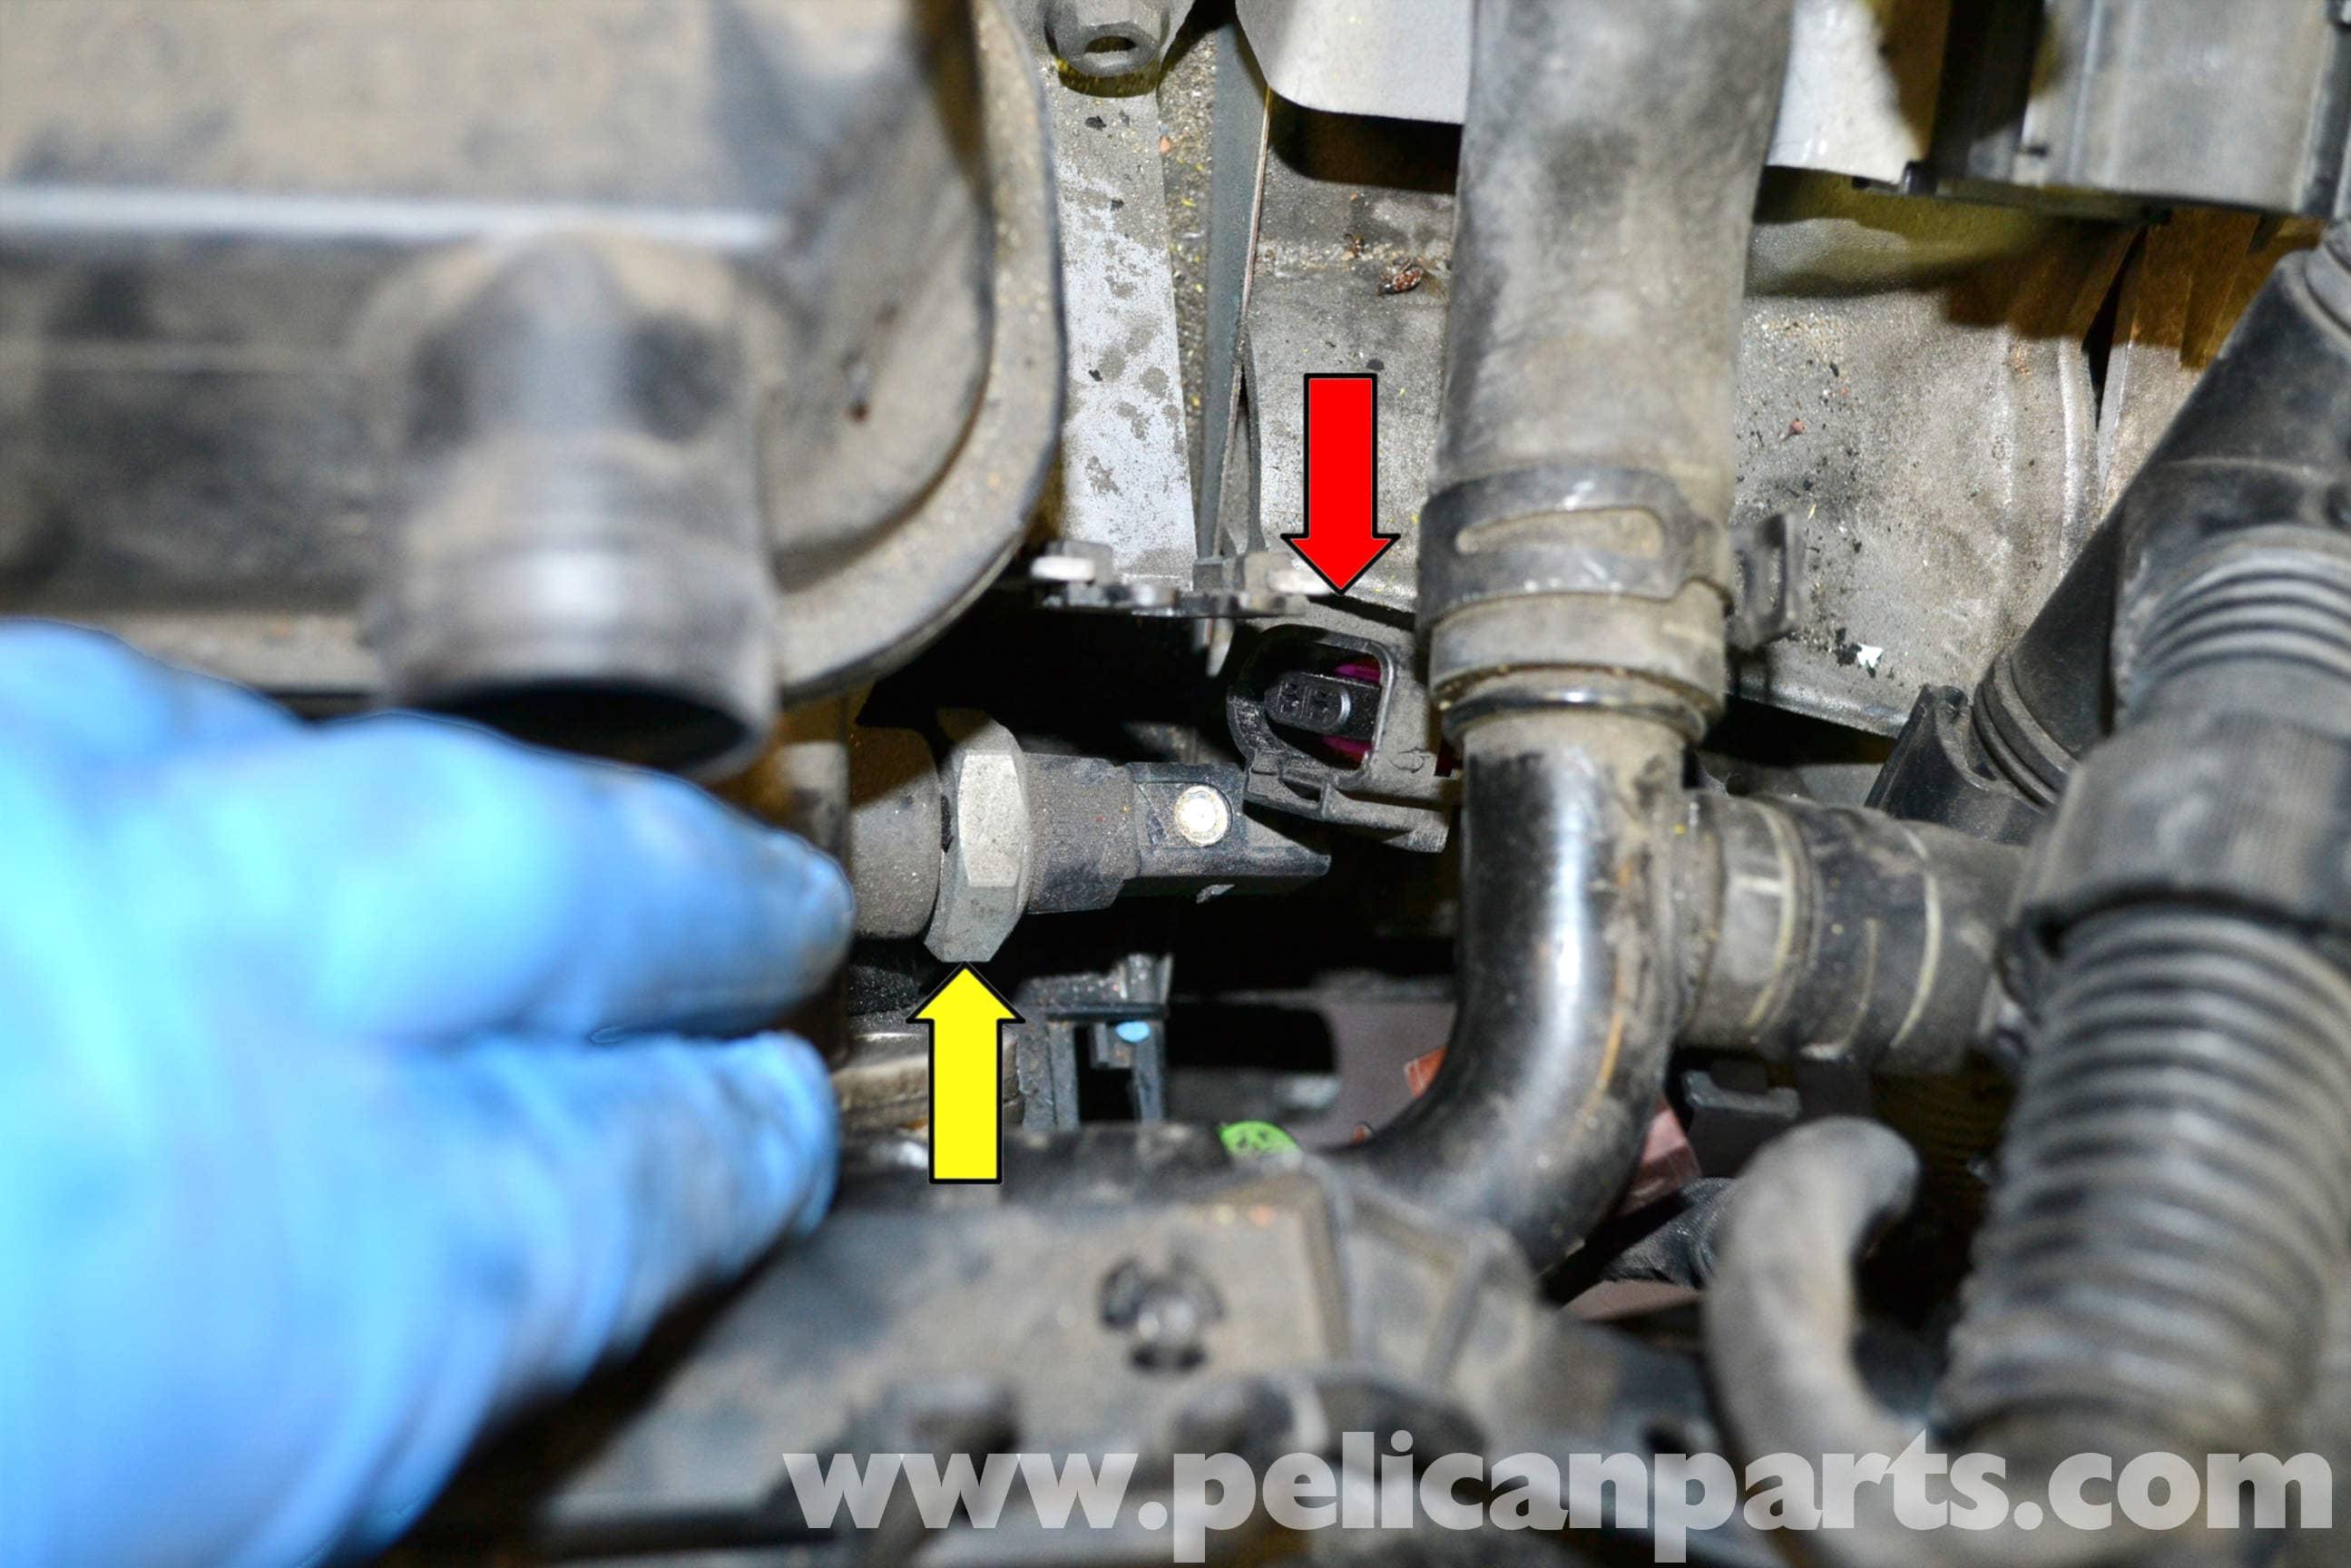 vw mk4 radio wiring diagram club car precedent headlight toyota corolla fuel filter location suzuki aerio librarylarge image extra large